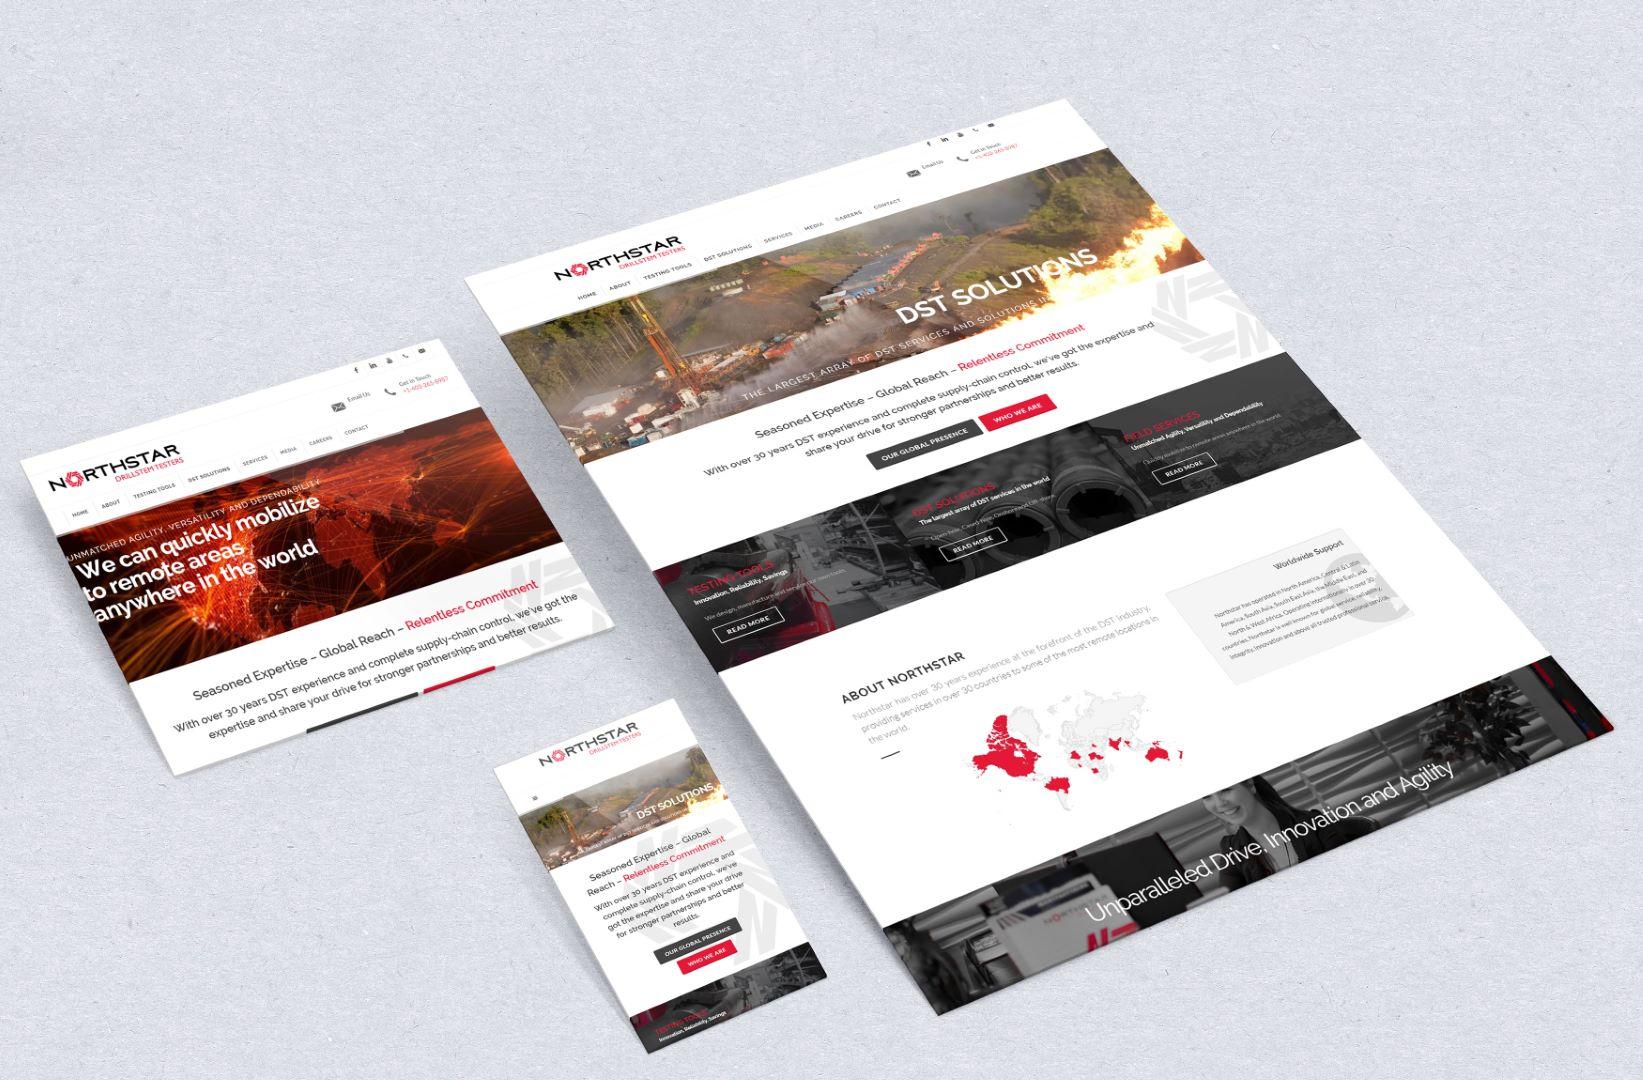 amortech web design northstar